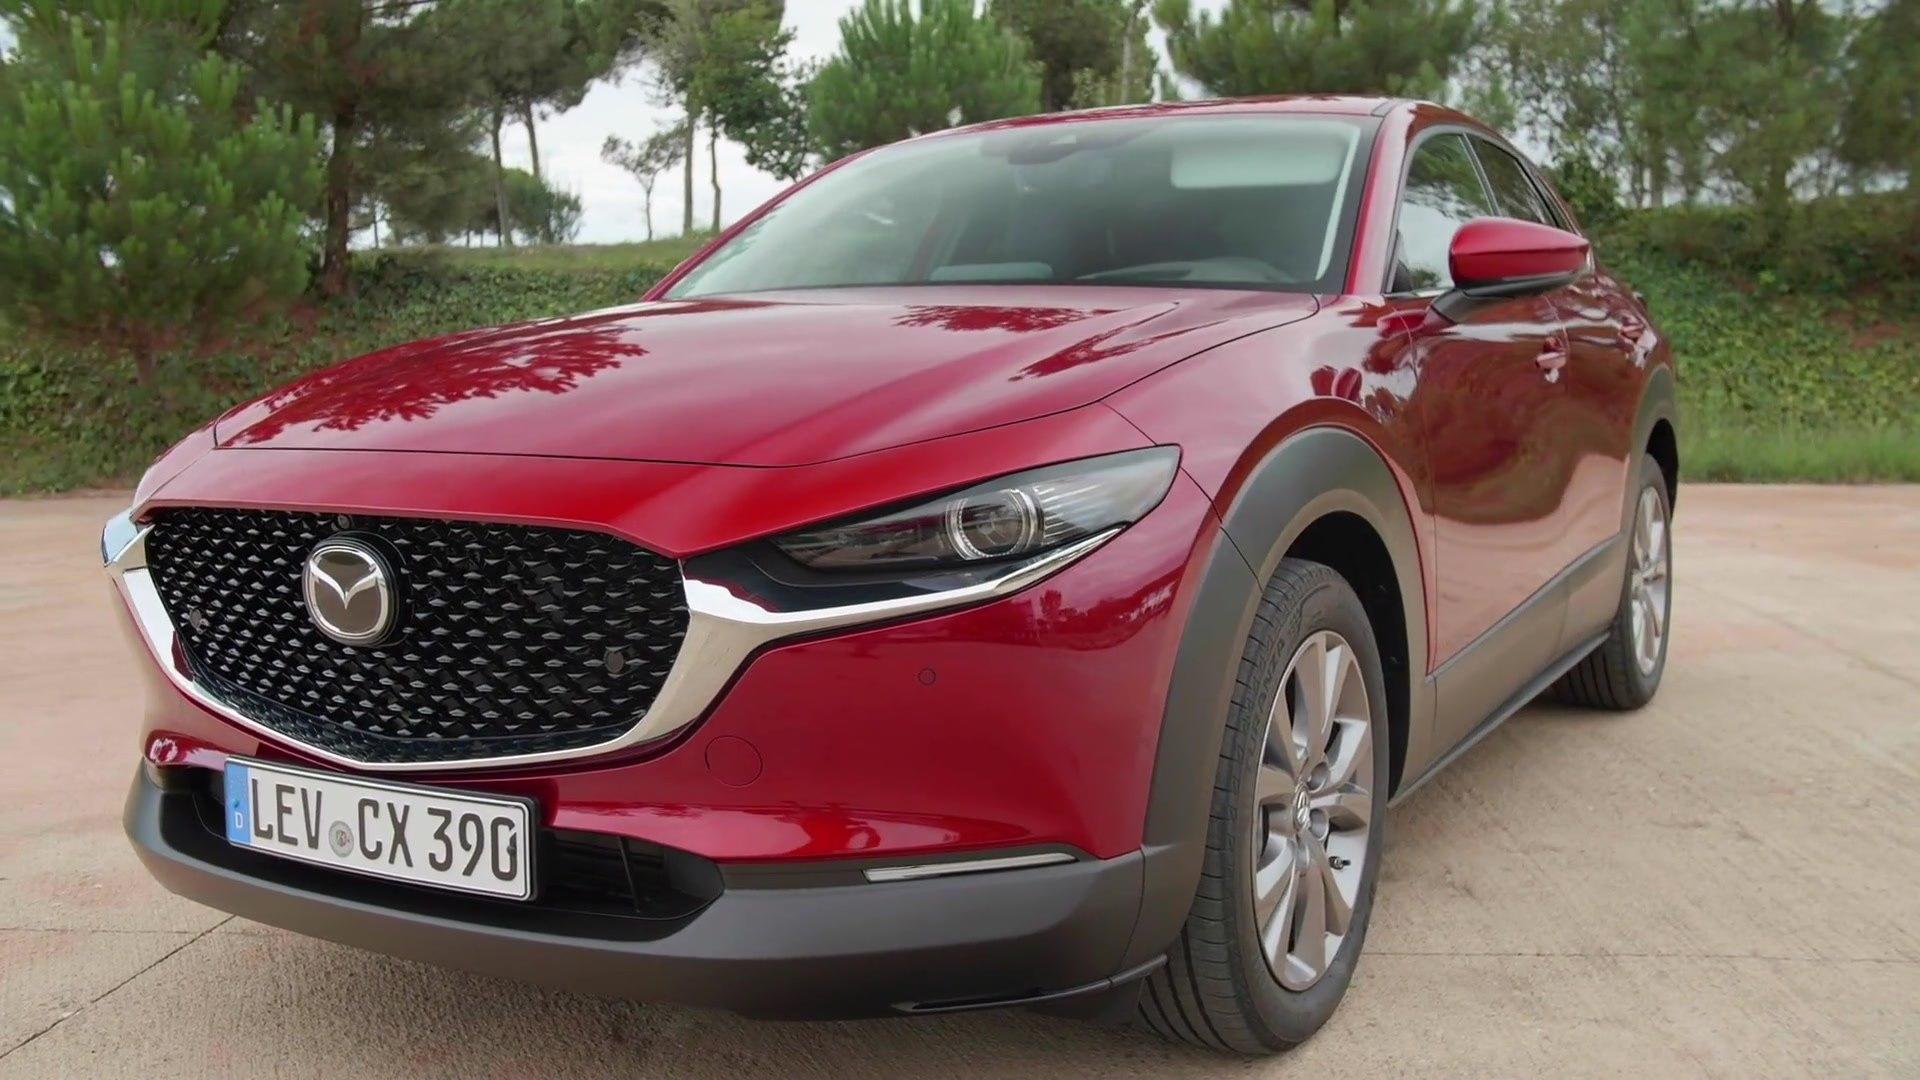 Kelebihan Kekurangan Mazda Cx Murah Berkualitas